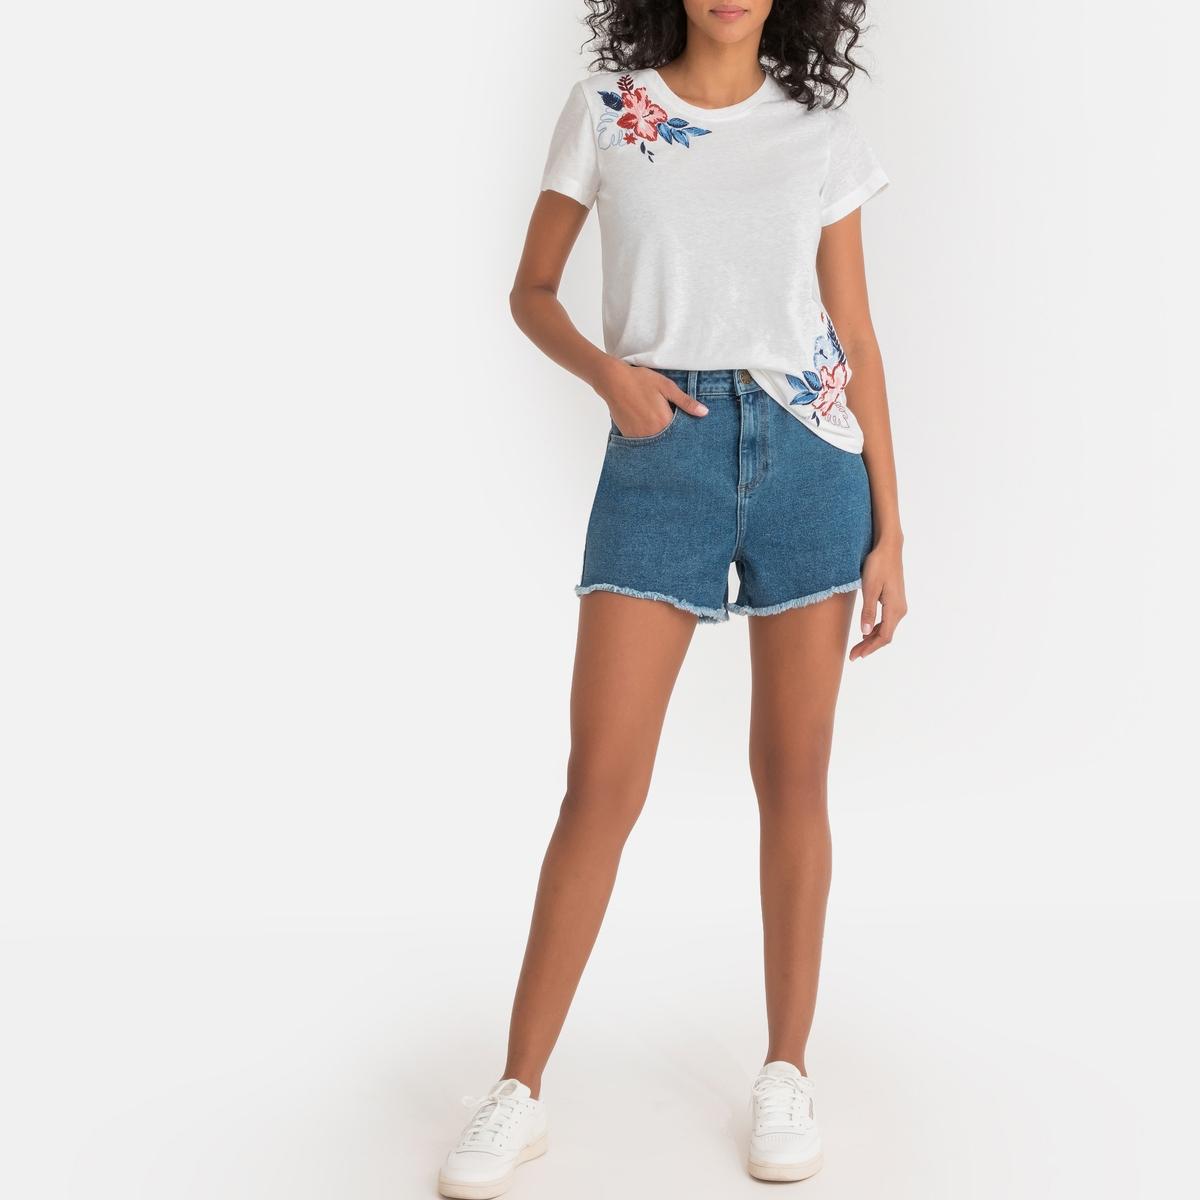 Imagen secundaria de producto de Camiseta estampada con cuello redondo Dhalia - Pepe Jeans